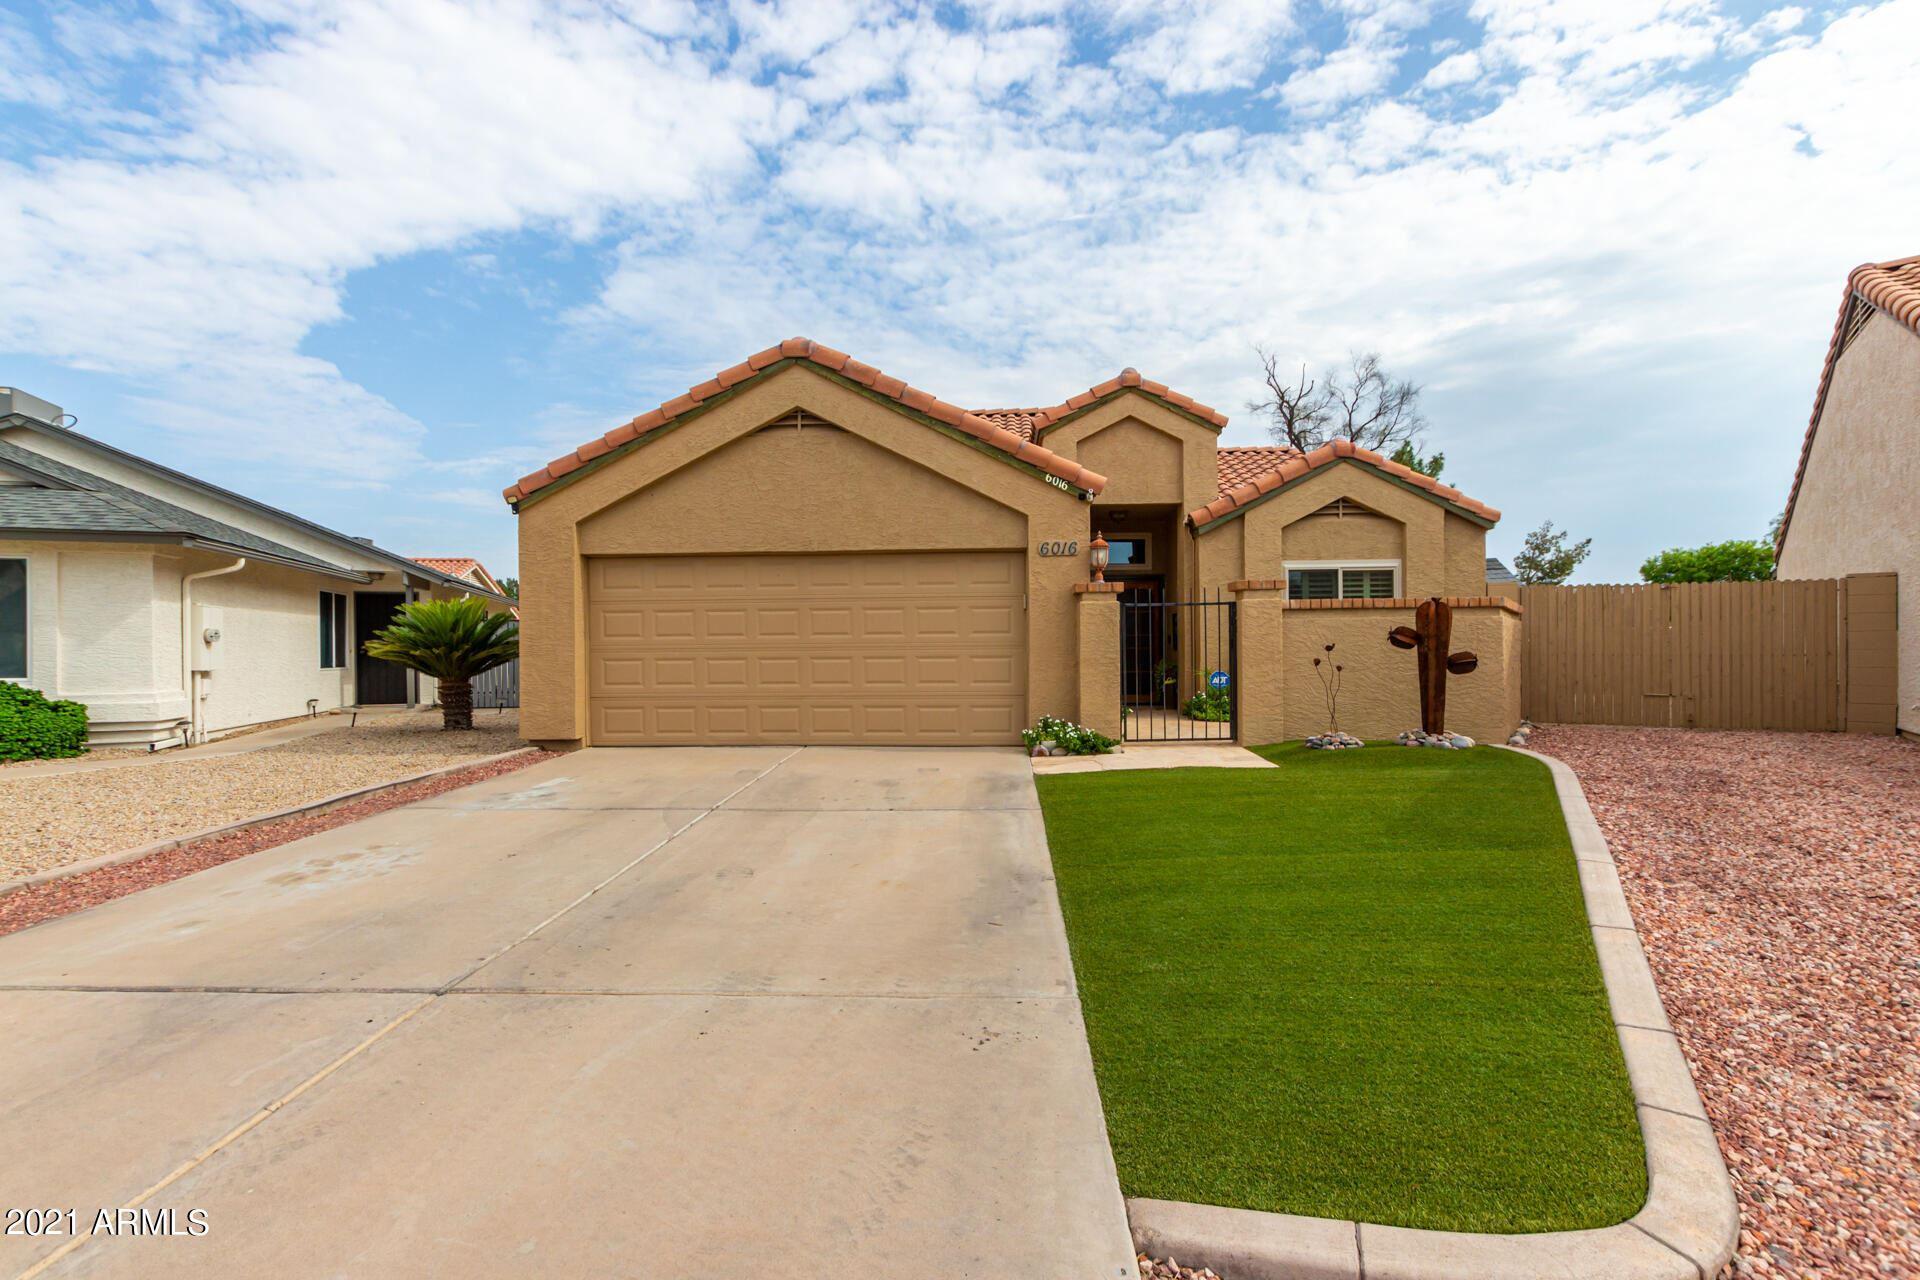 Photo of 6016 W SHANGRI LA Road, Glendale, AZ 85304 (MLS # 6295868)